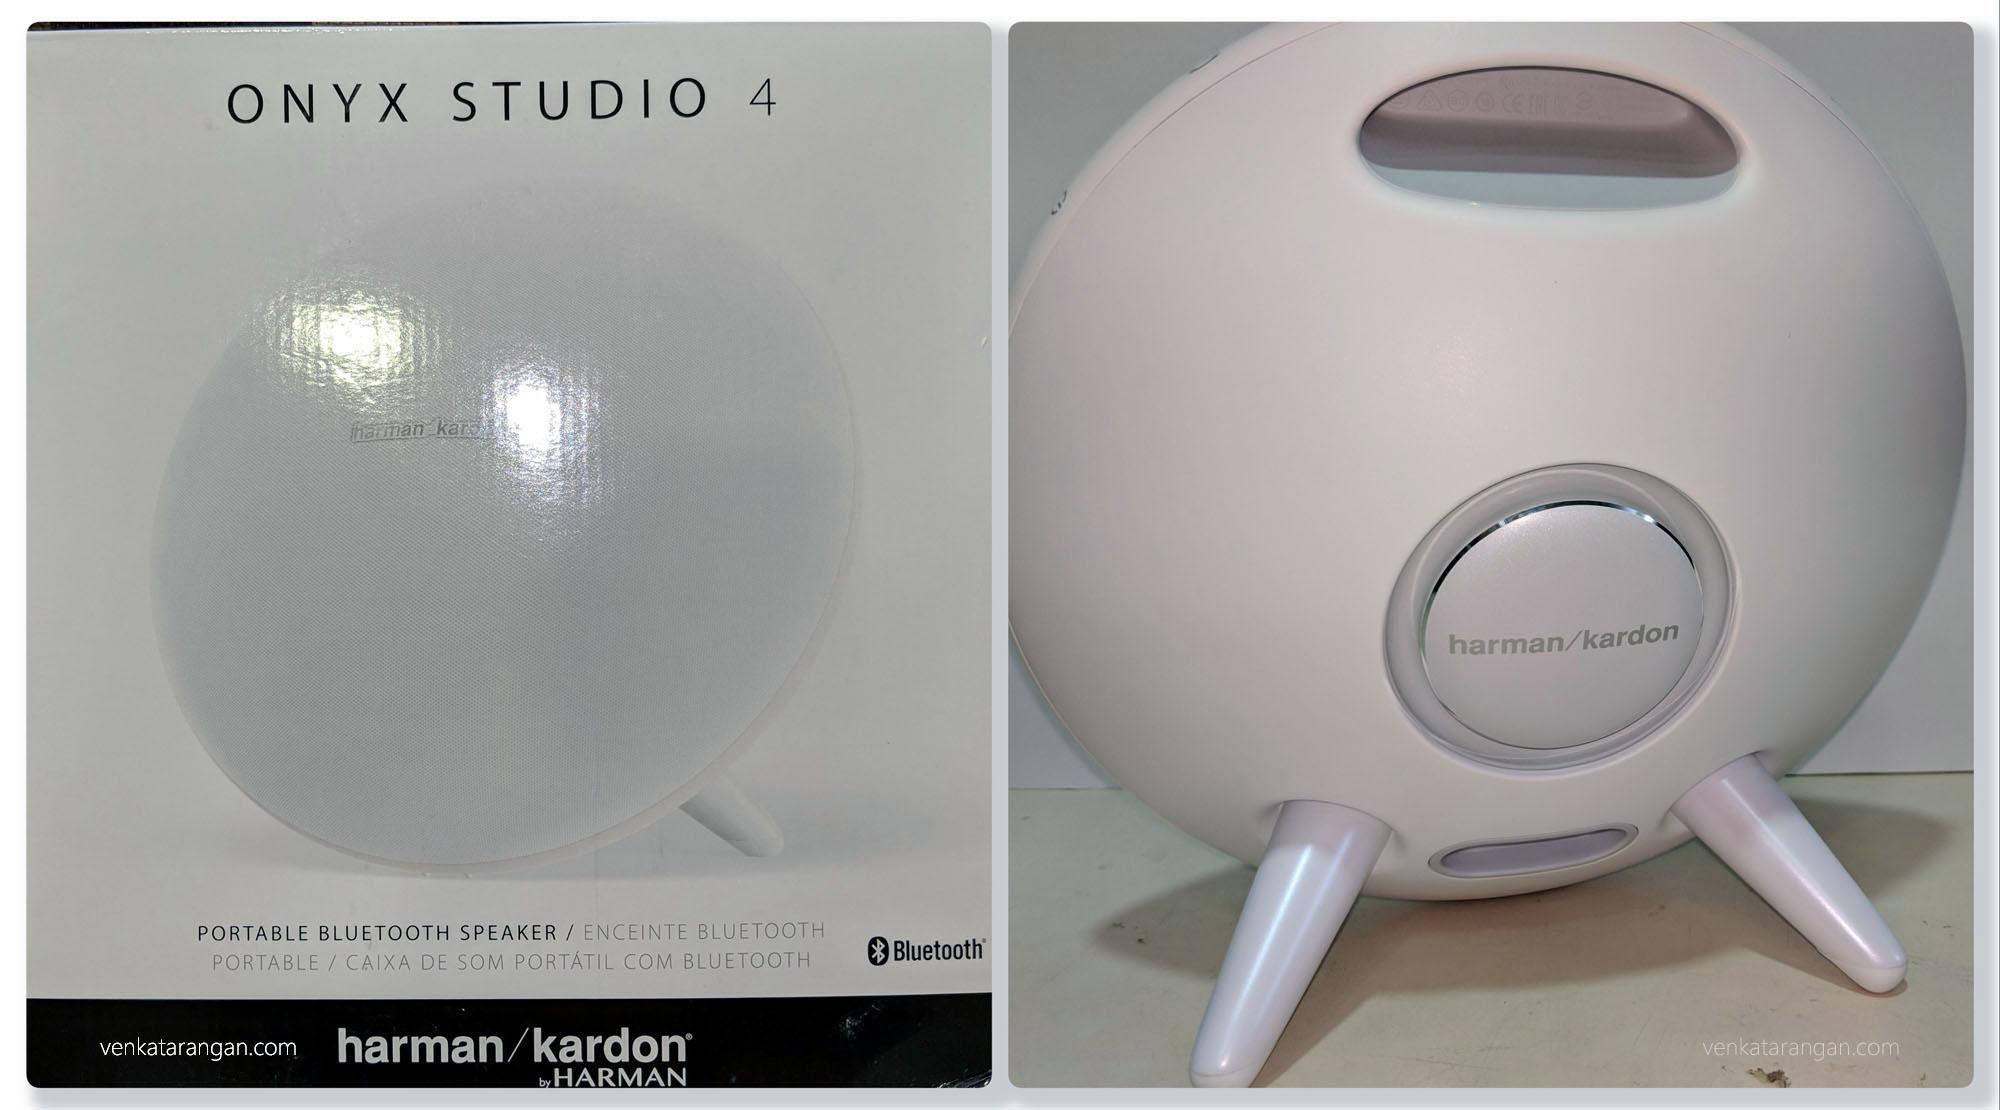 Harman Kardon Onyx Studio 4 Bluetooth Speaker